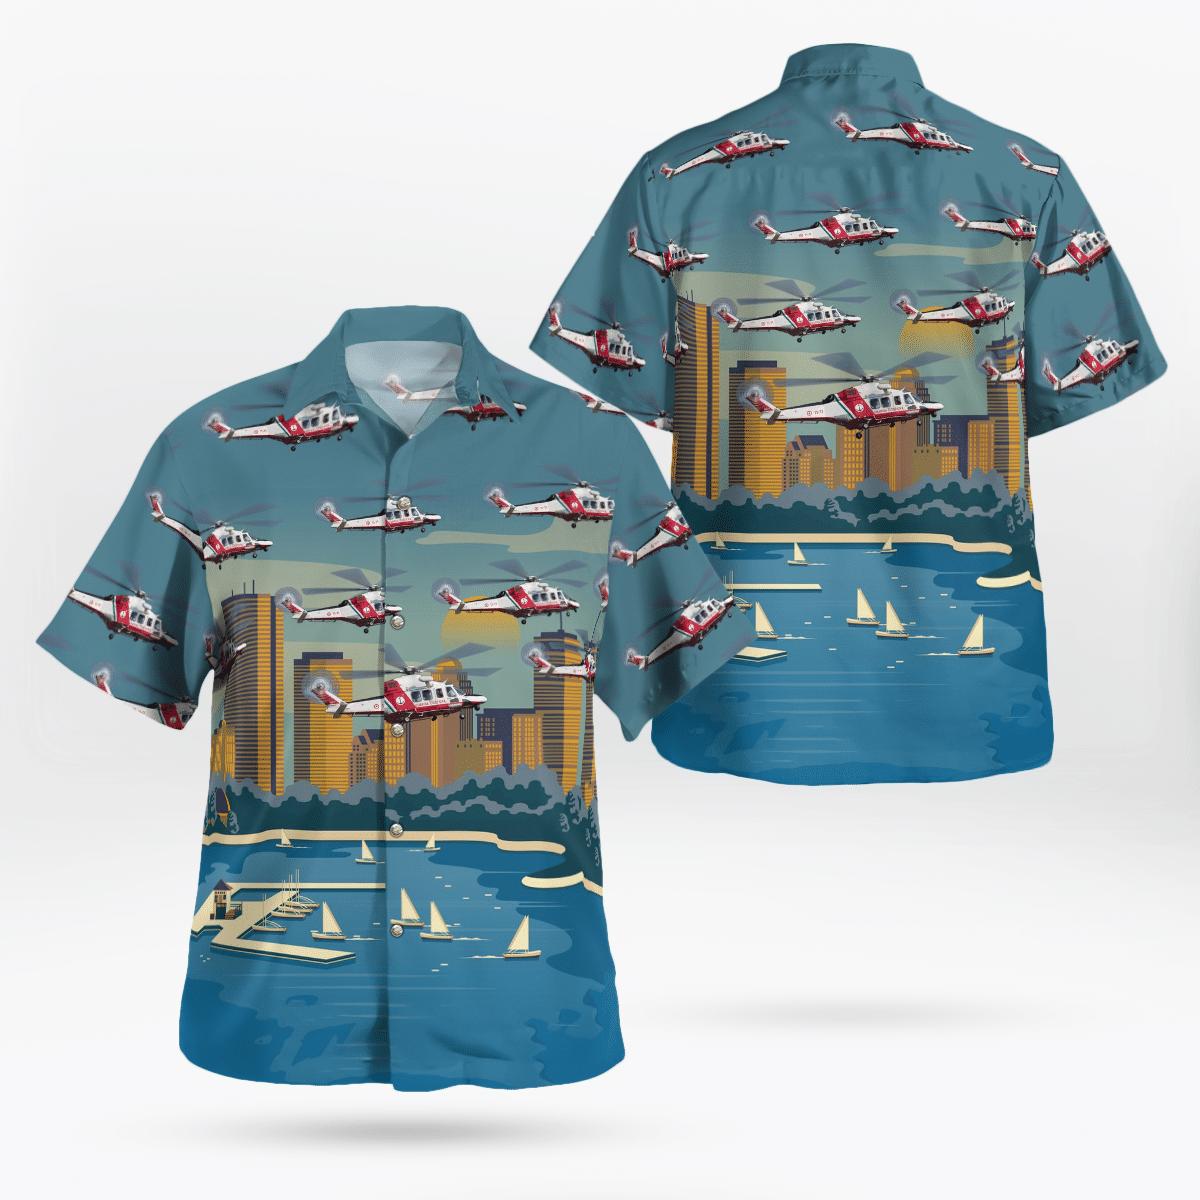 Guardia Costiera AgustaWestland AW139 Hawaiian shirt Servizio Aereo della